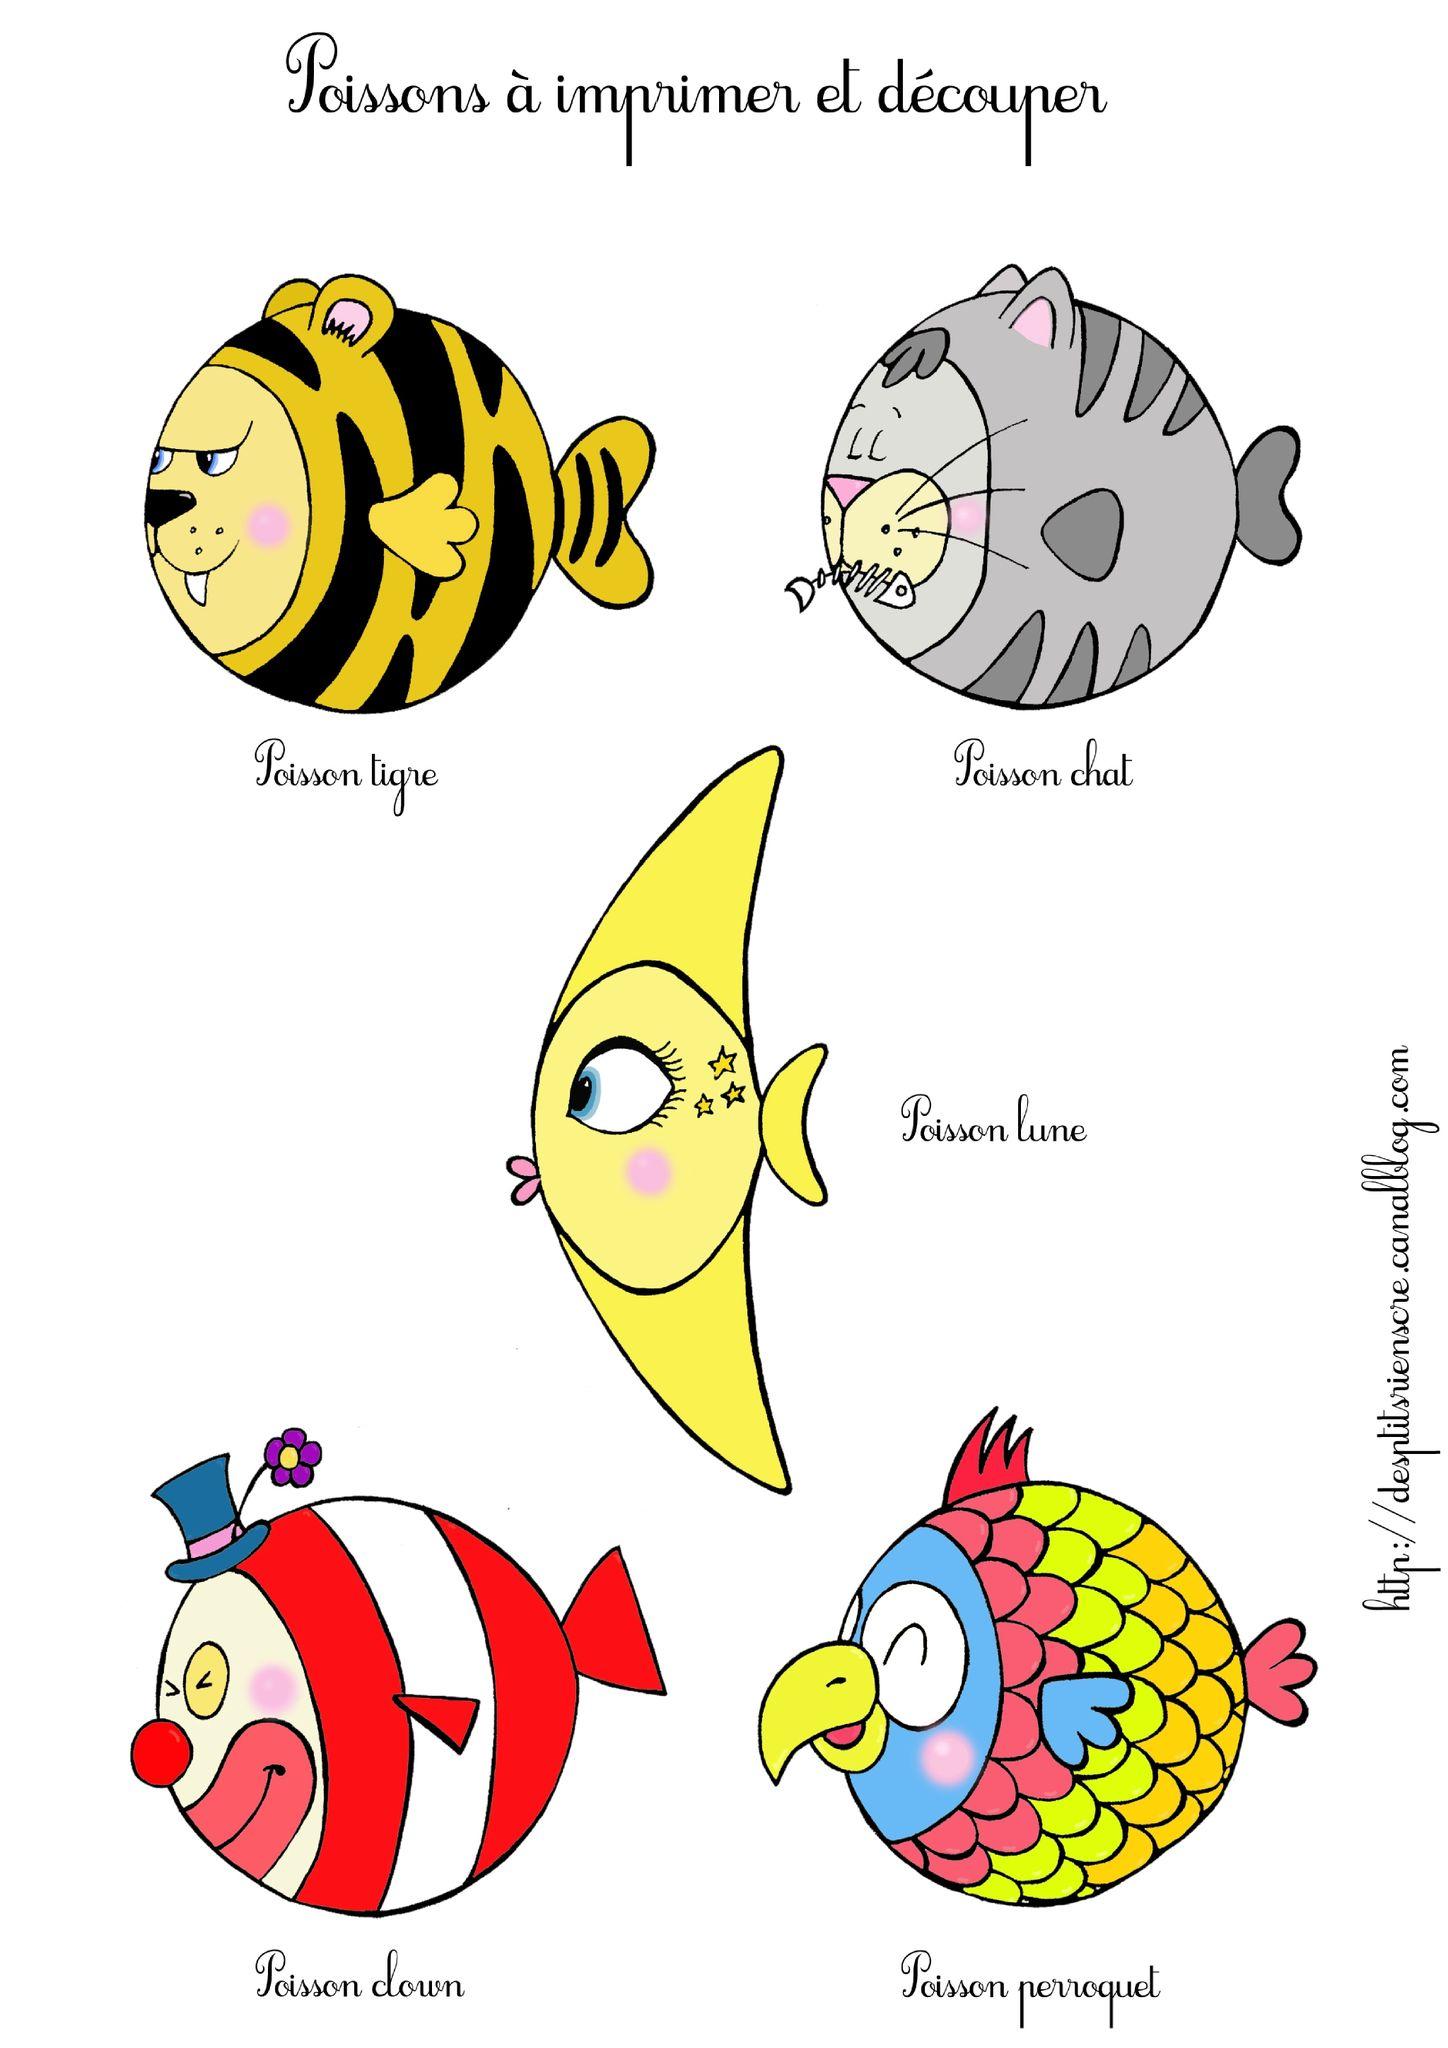 Poissons rigolos imprimer des p 39 tits riens - Imprimer poisson d avril ...